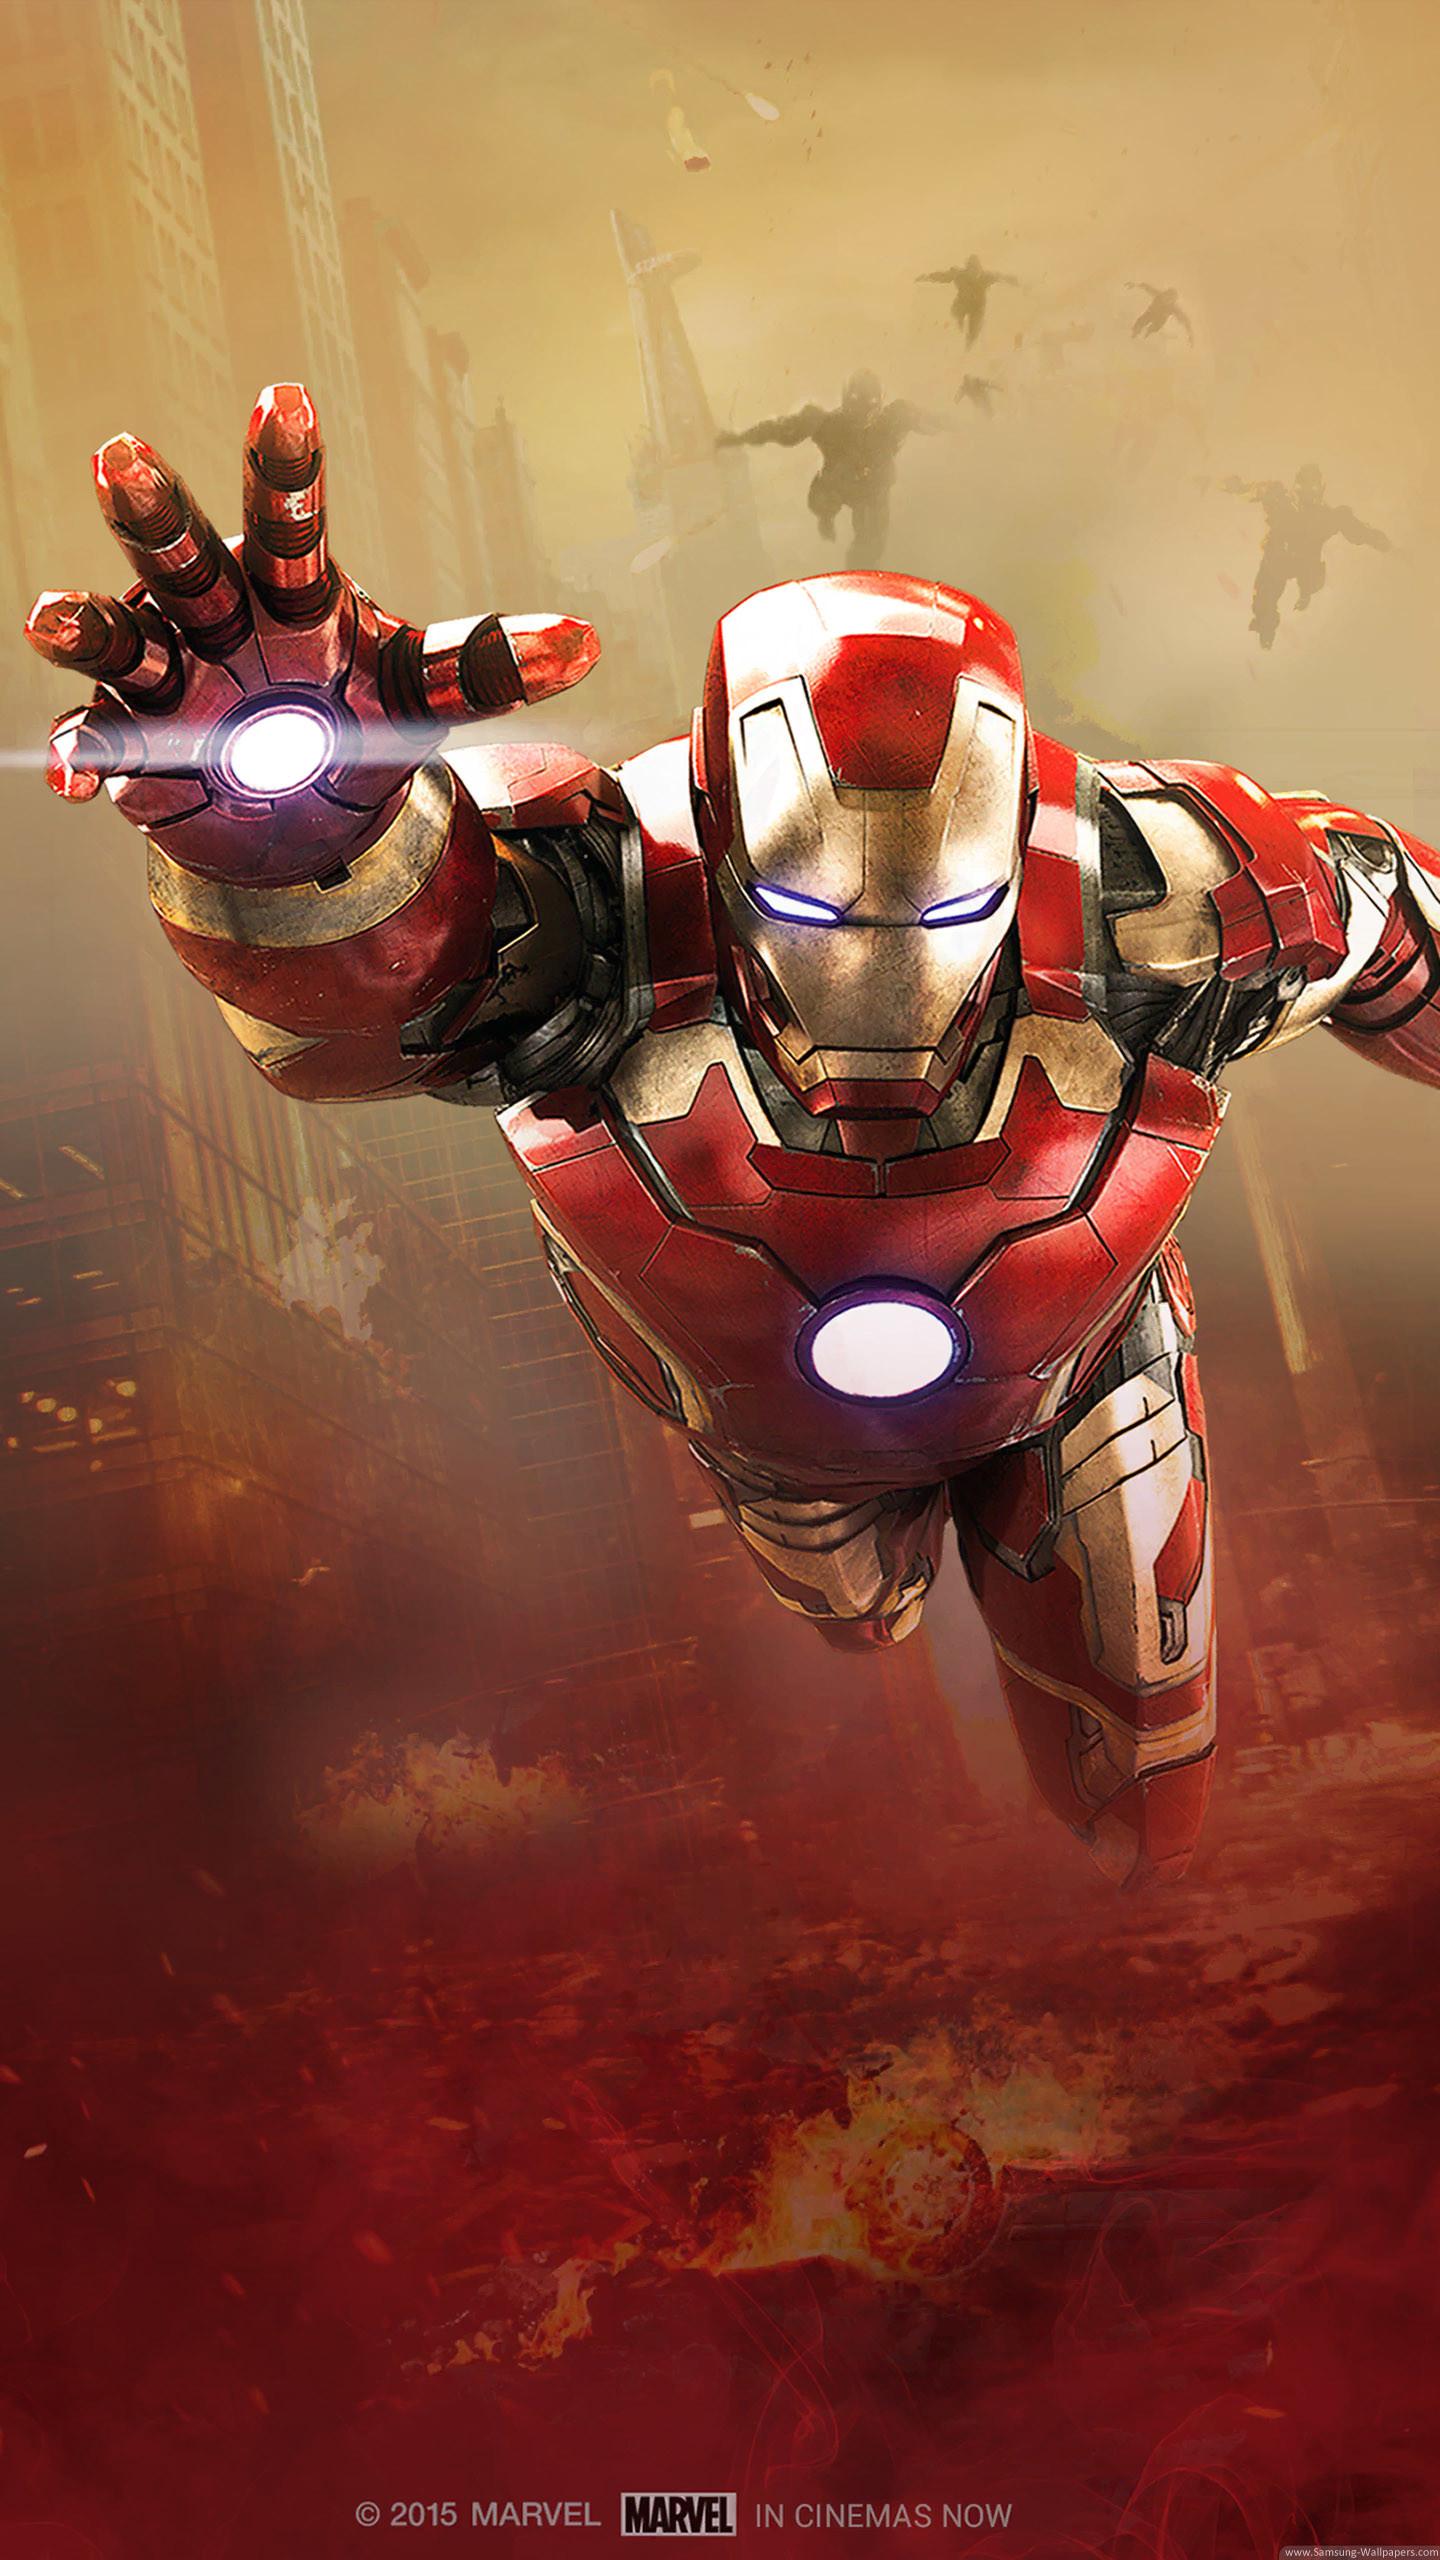 Download mobile wallpaper: Cinema, Iron Man, free. 13303.   Download  Wallpaper   Pinterest   Mobile wallpaper, Wallpaper and Comic